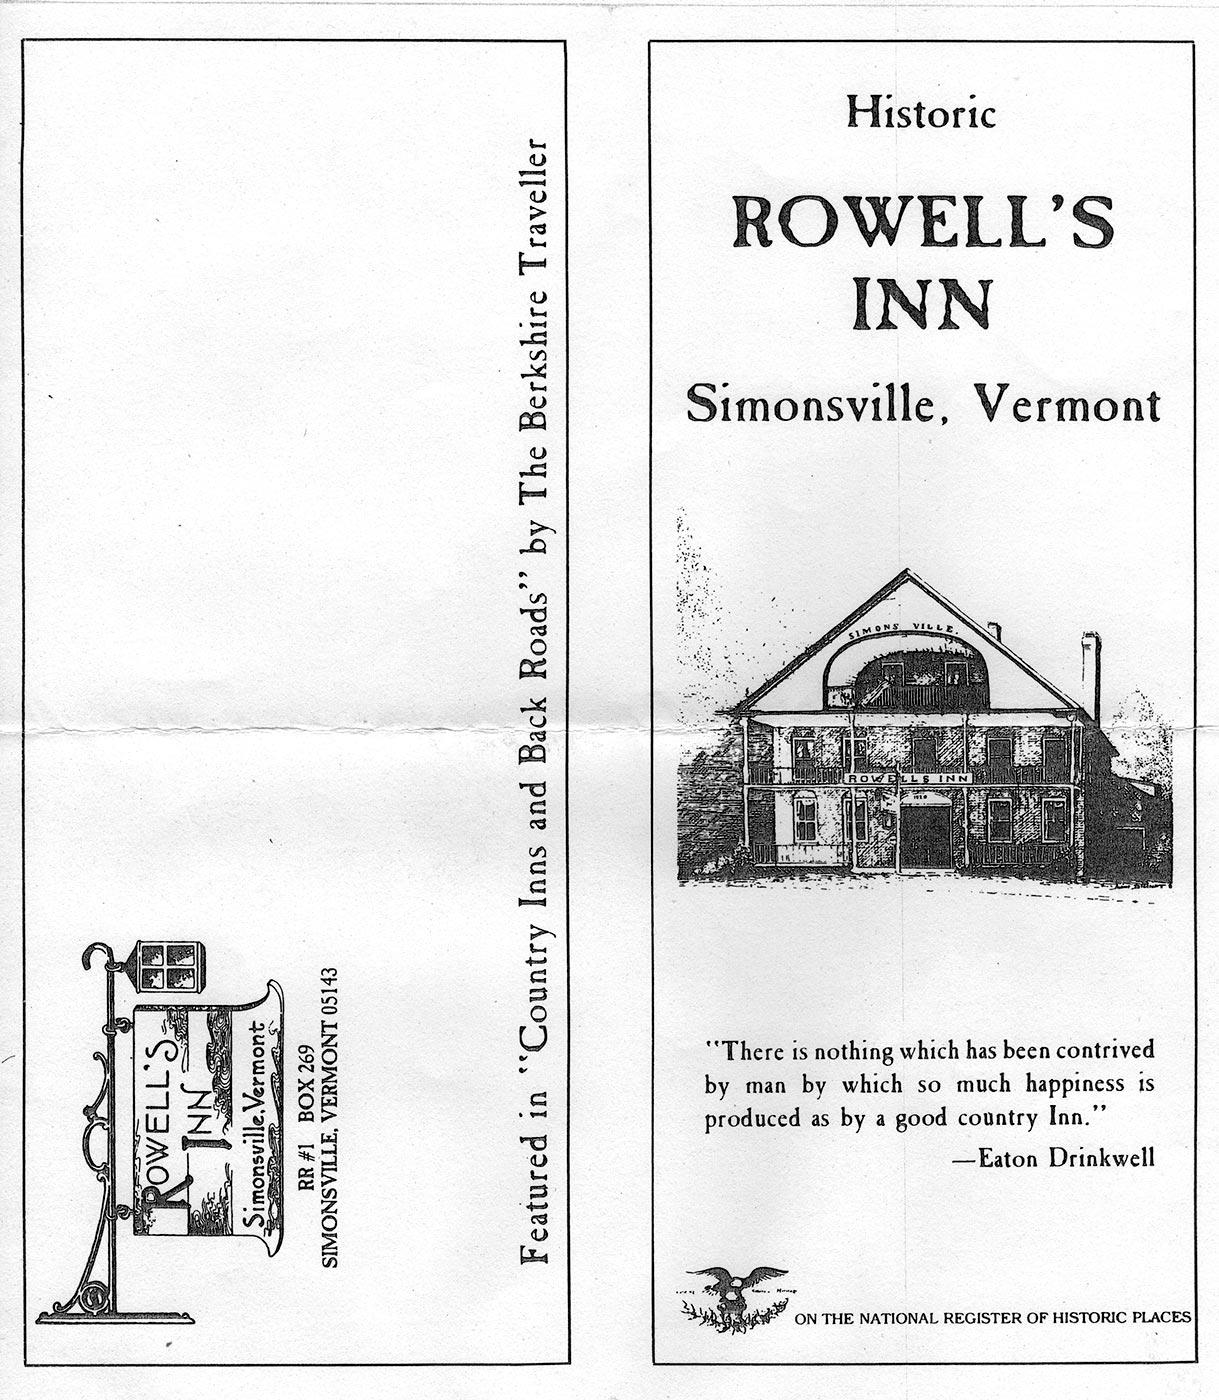 Rowell's Inn - Old Brochure